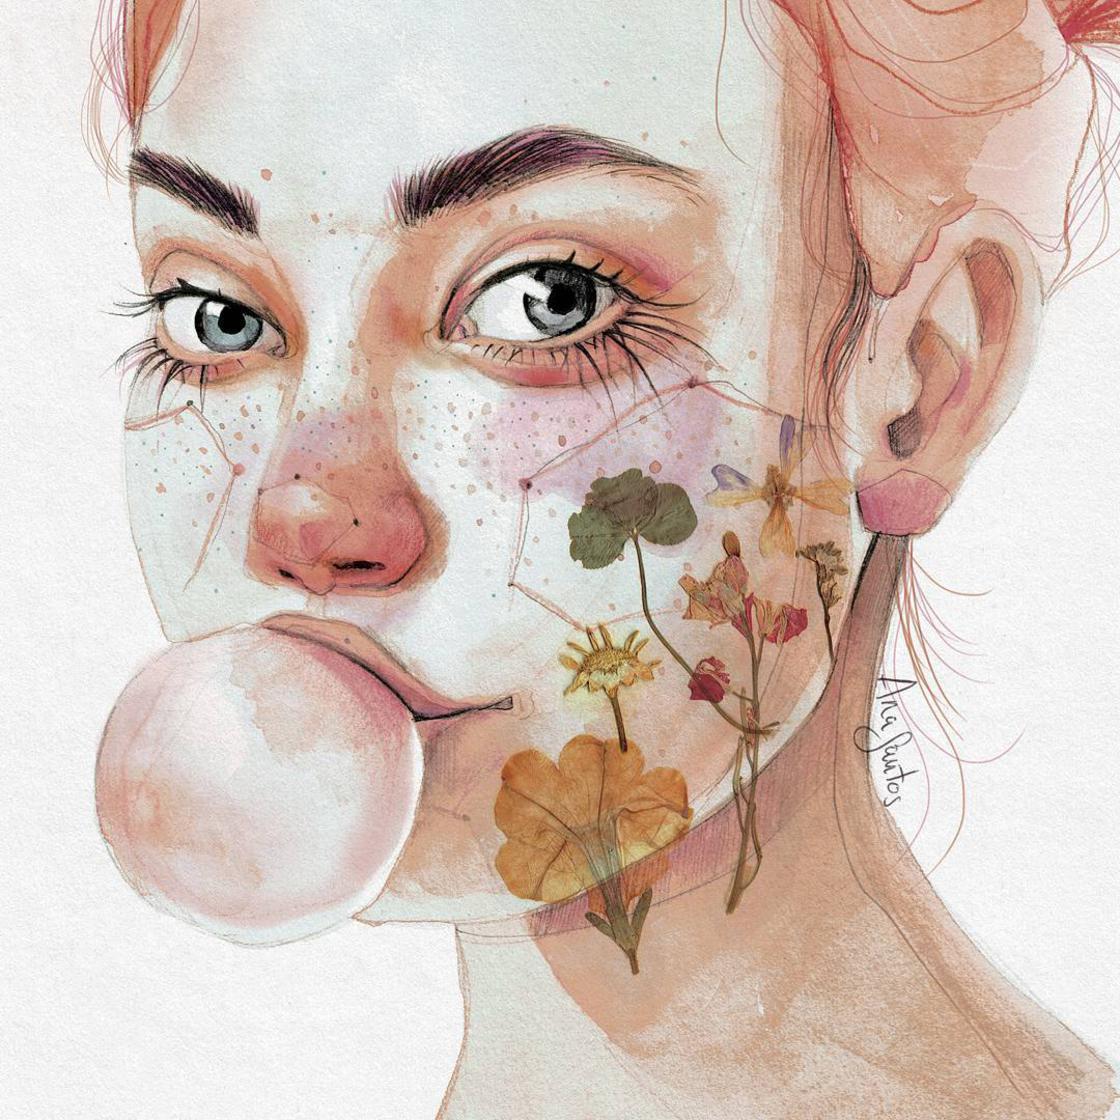 ana-santos-girl-portraits-21.jpg